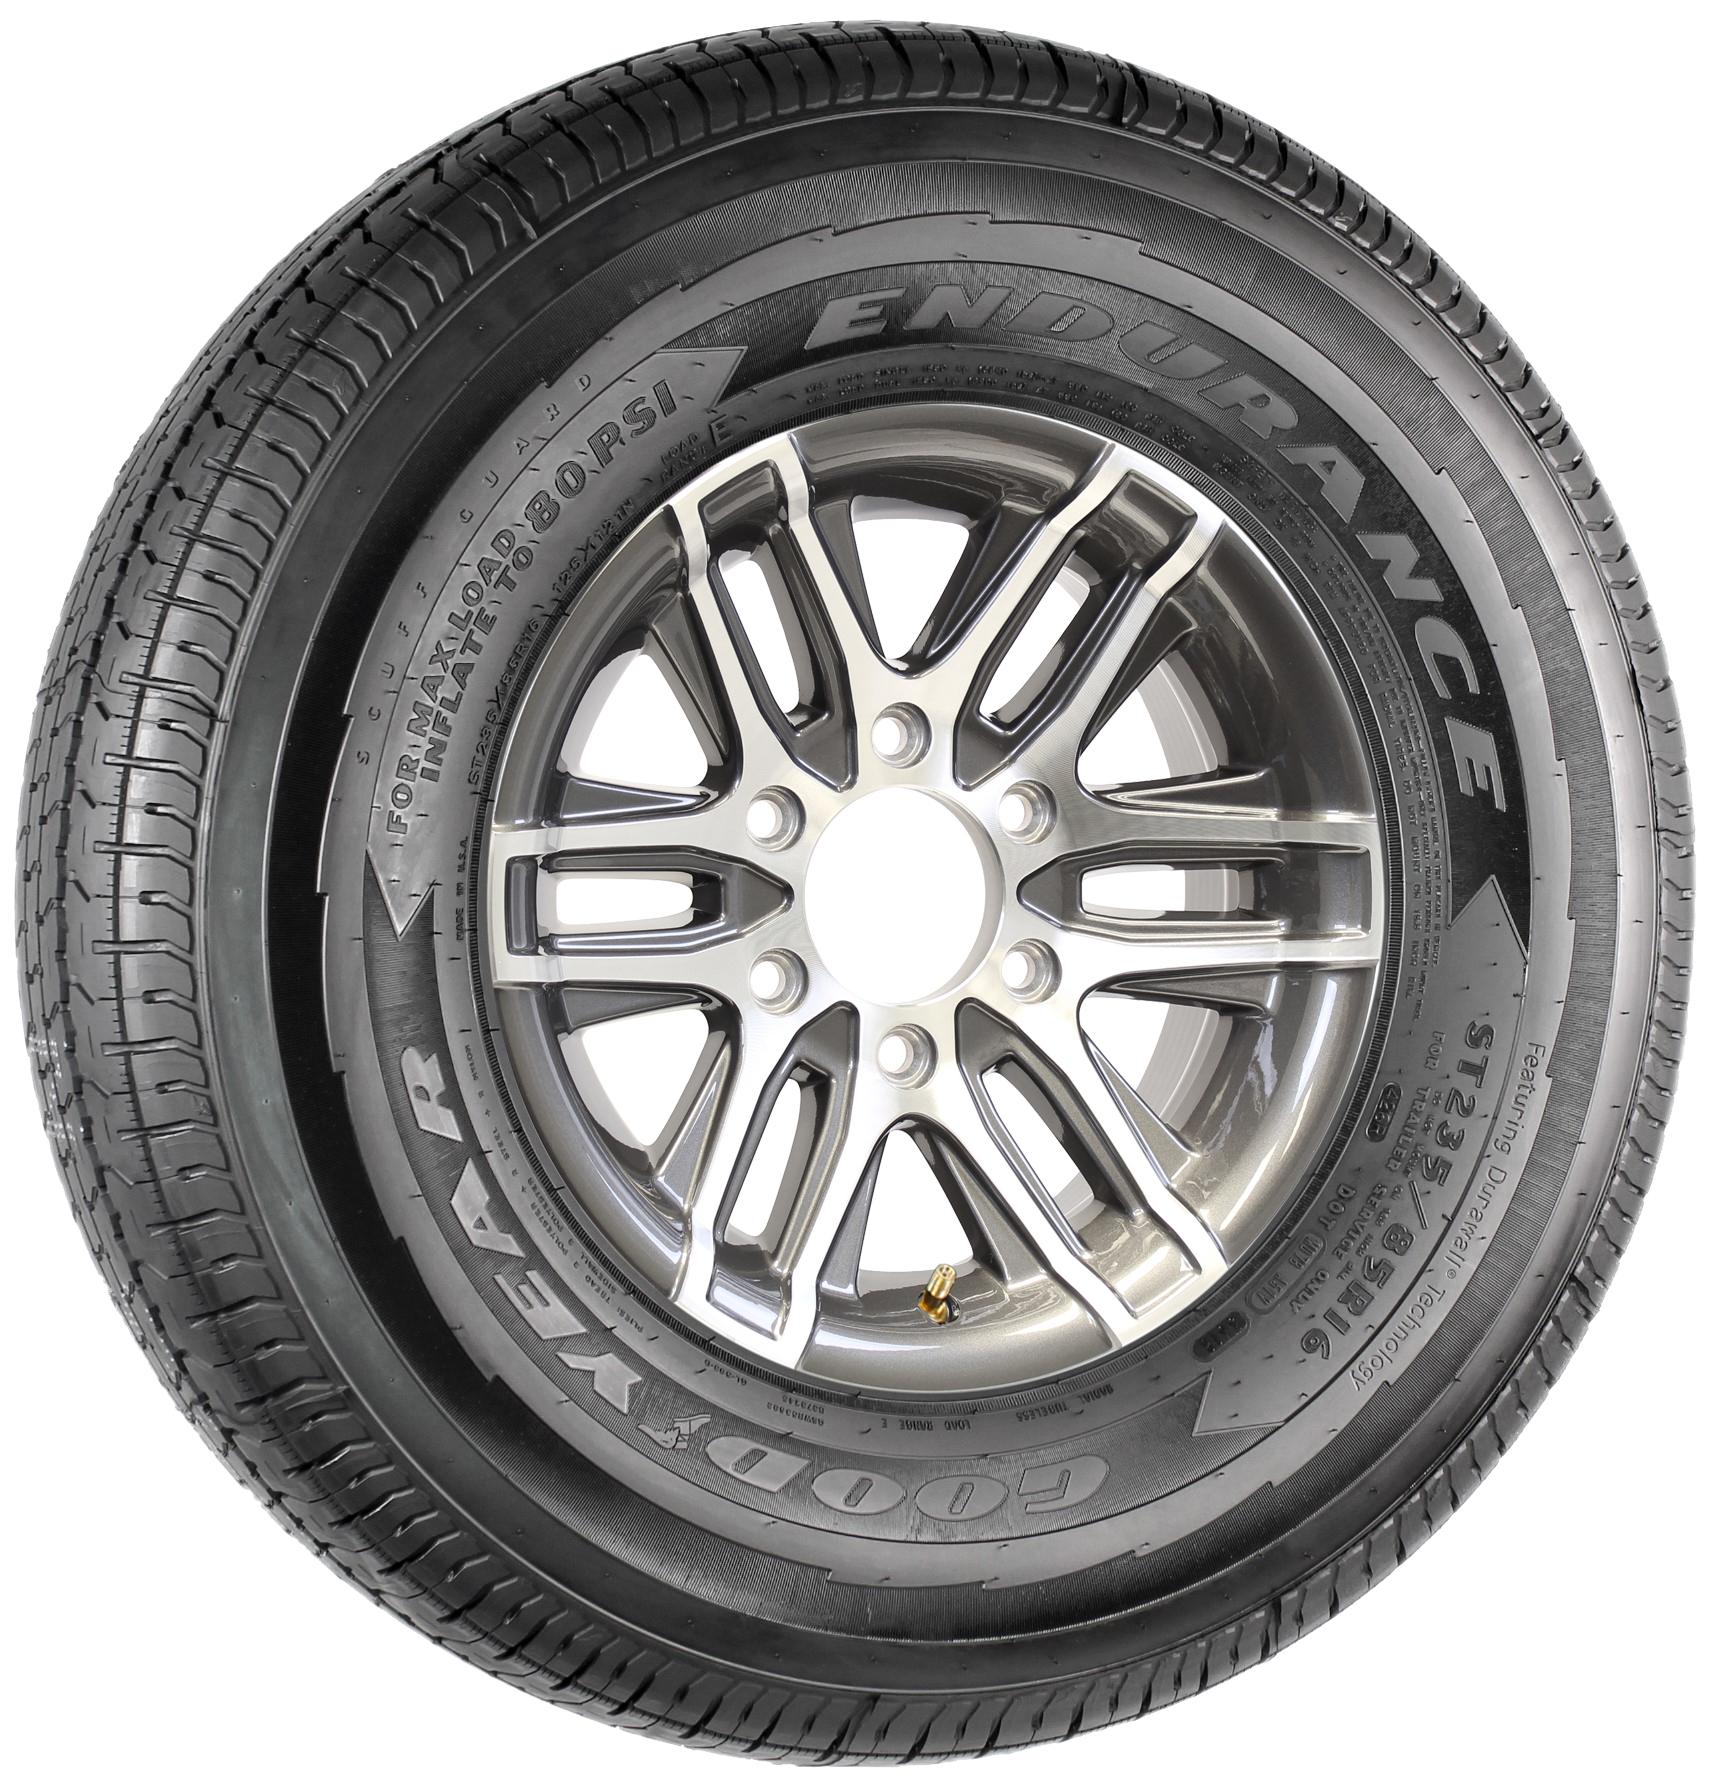 "Goodyear Endurance ST235/85R16 LRE on 16"" 6-5.5 Altitude Gun Metal Aluminum Wheel Image"